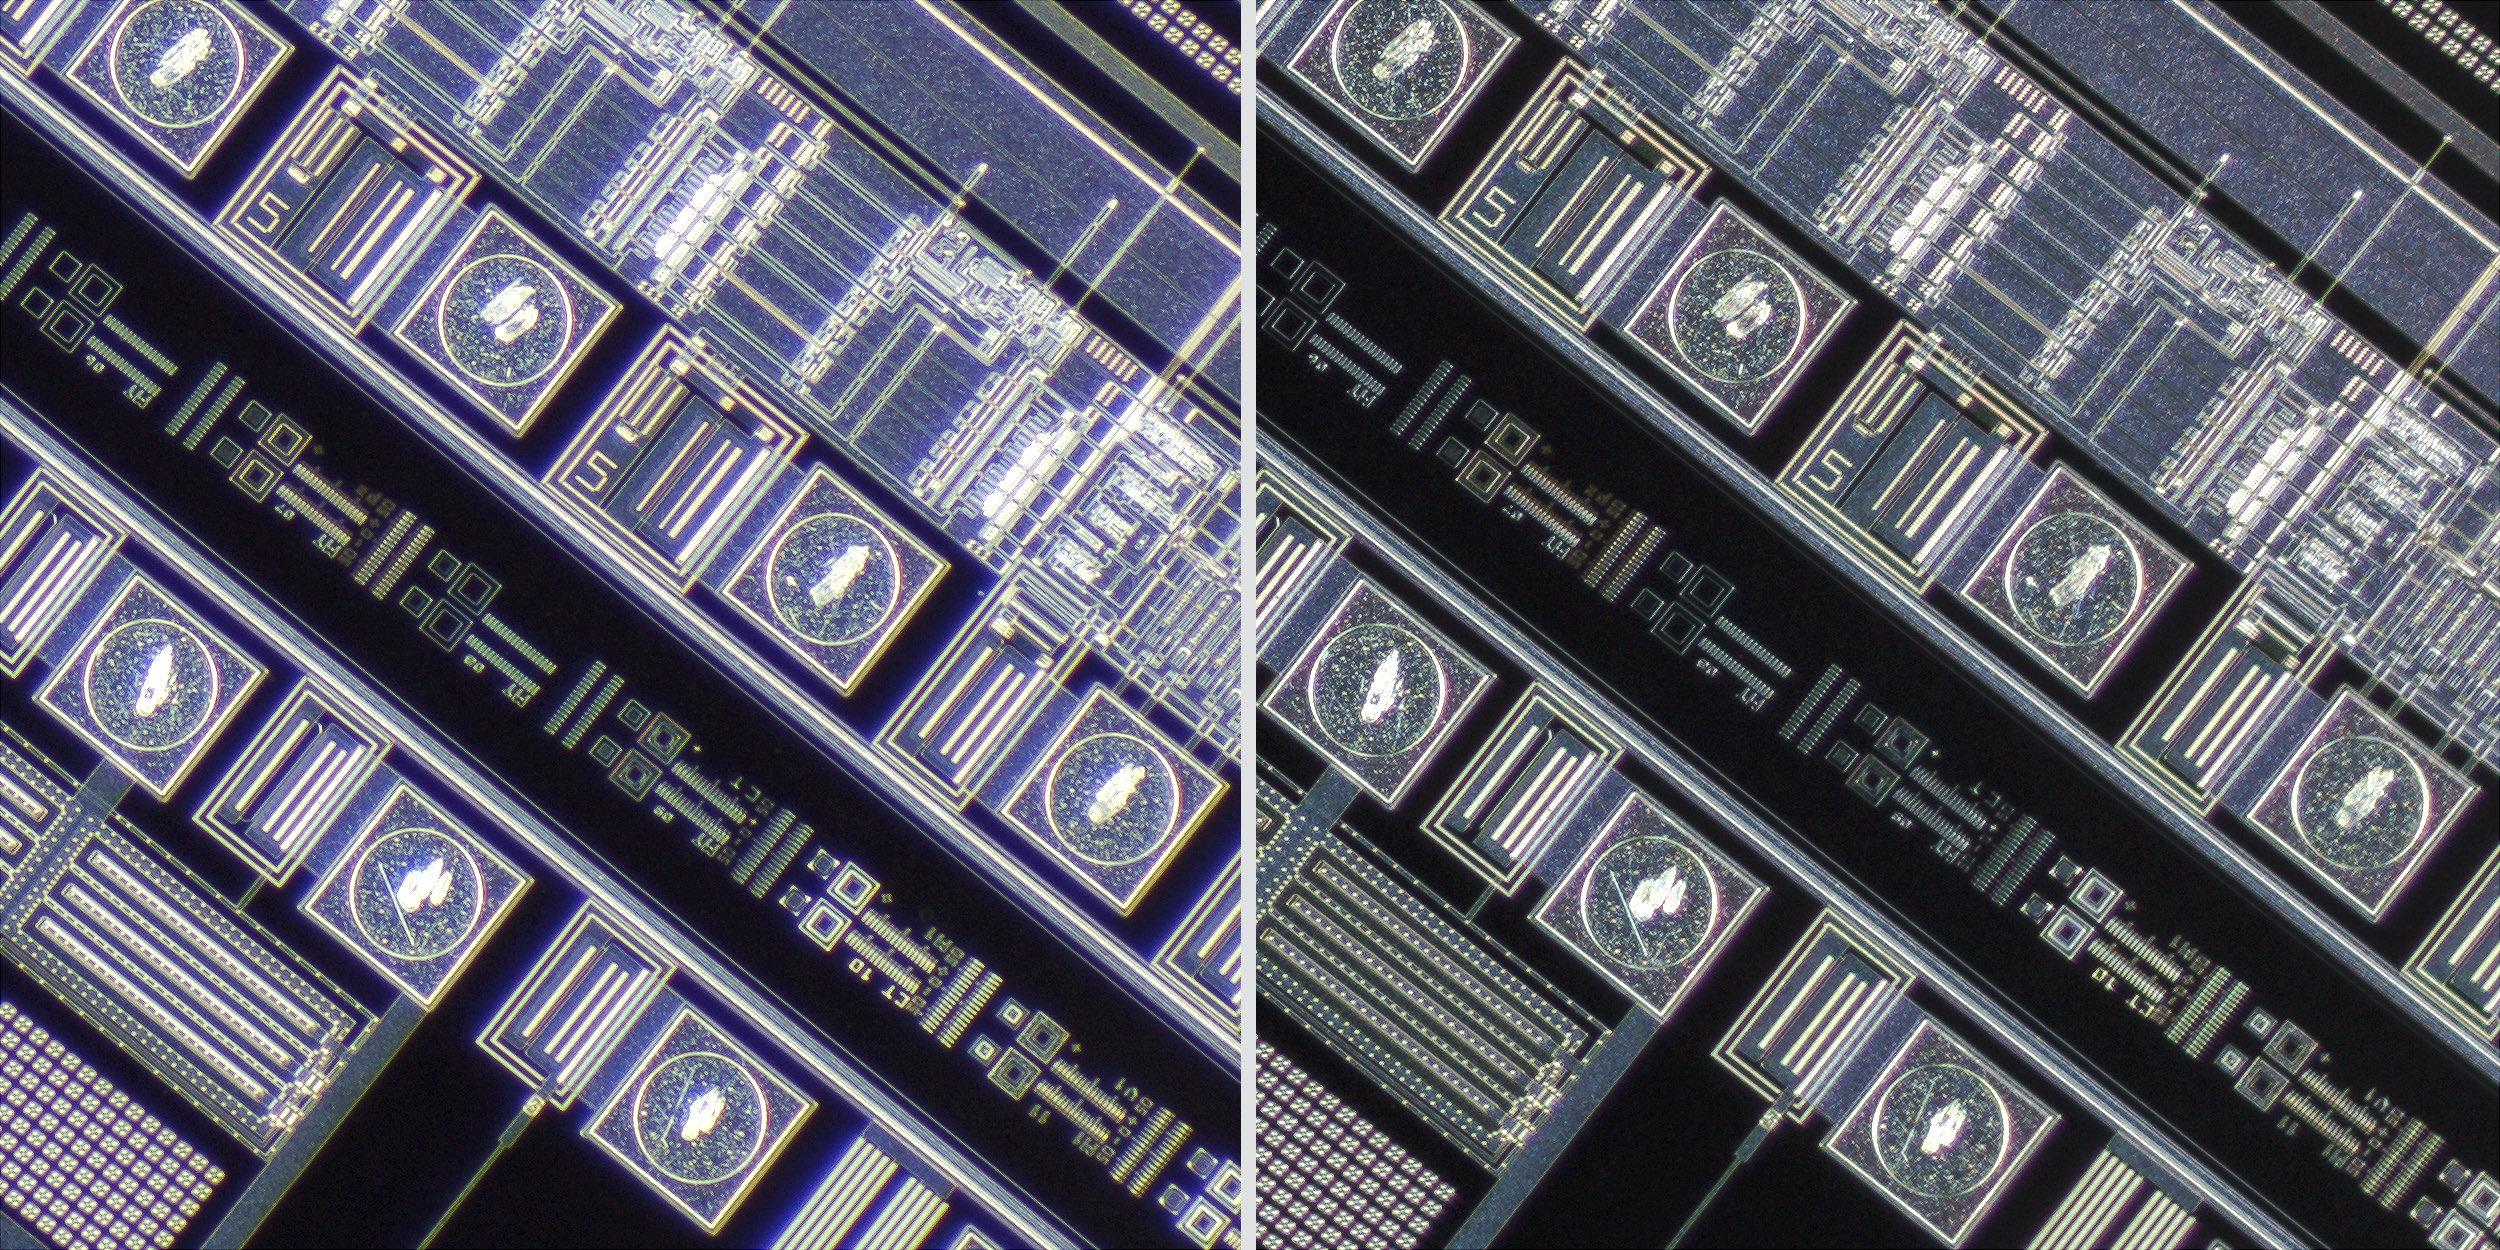 Nikon MM 5x-A EDF20052 TM objective lens vs Sigma 150 f2.8 OS + Xenon 28mm f2 Line Scan Lens 100% Corner Crops